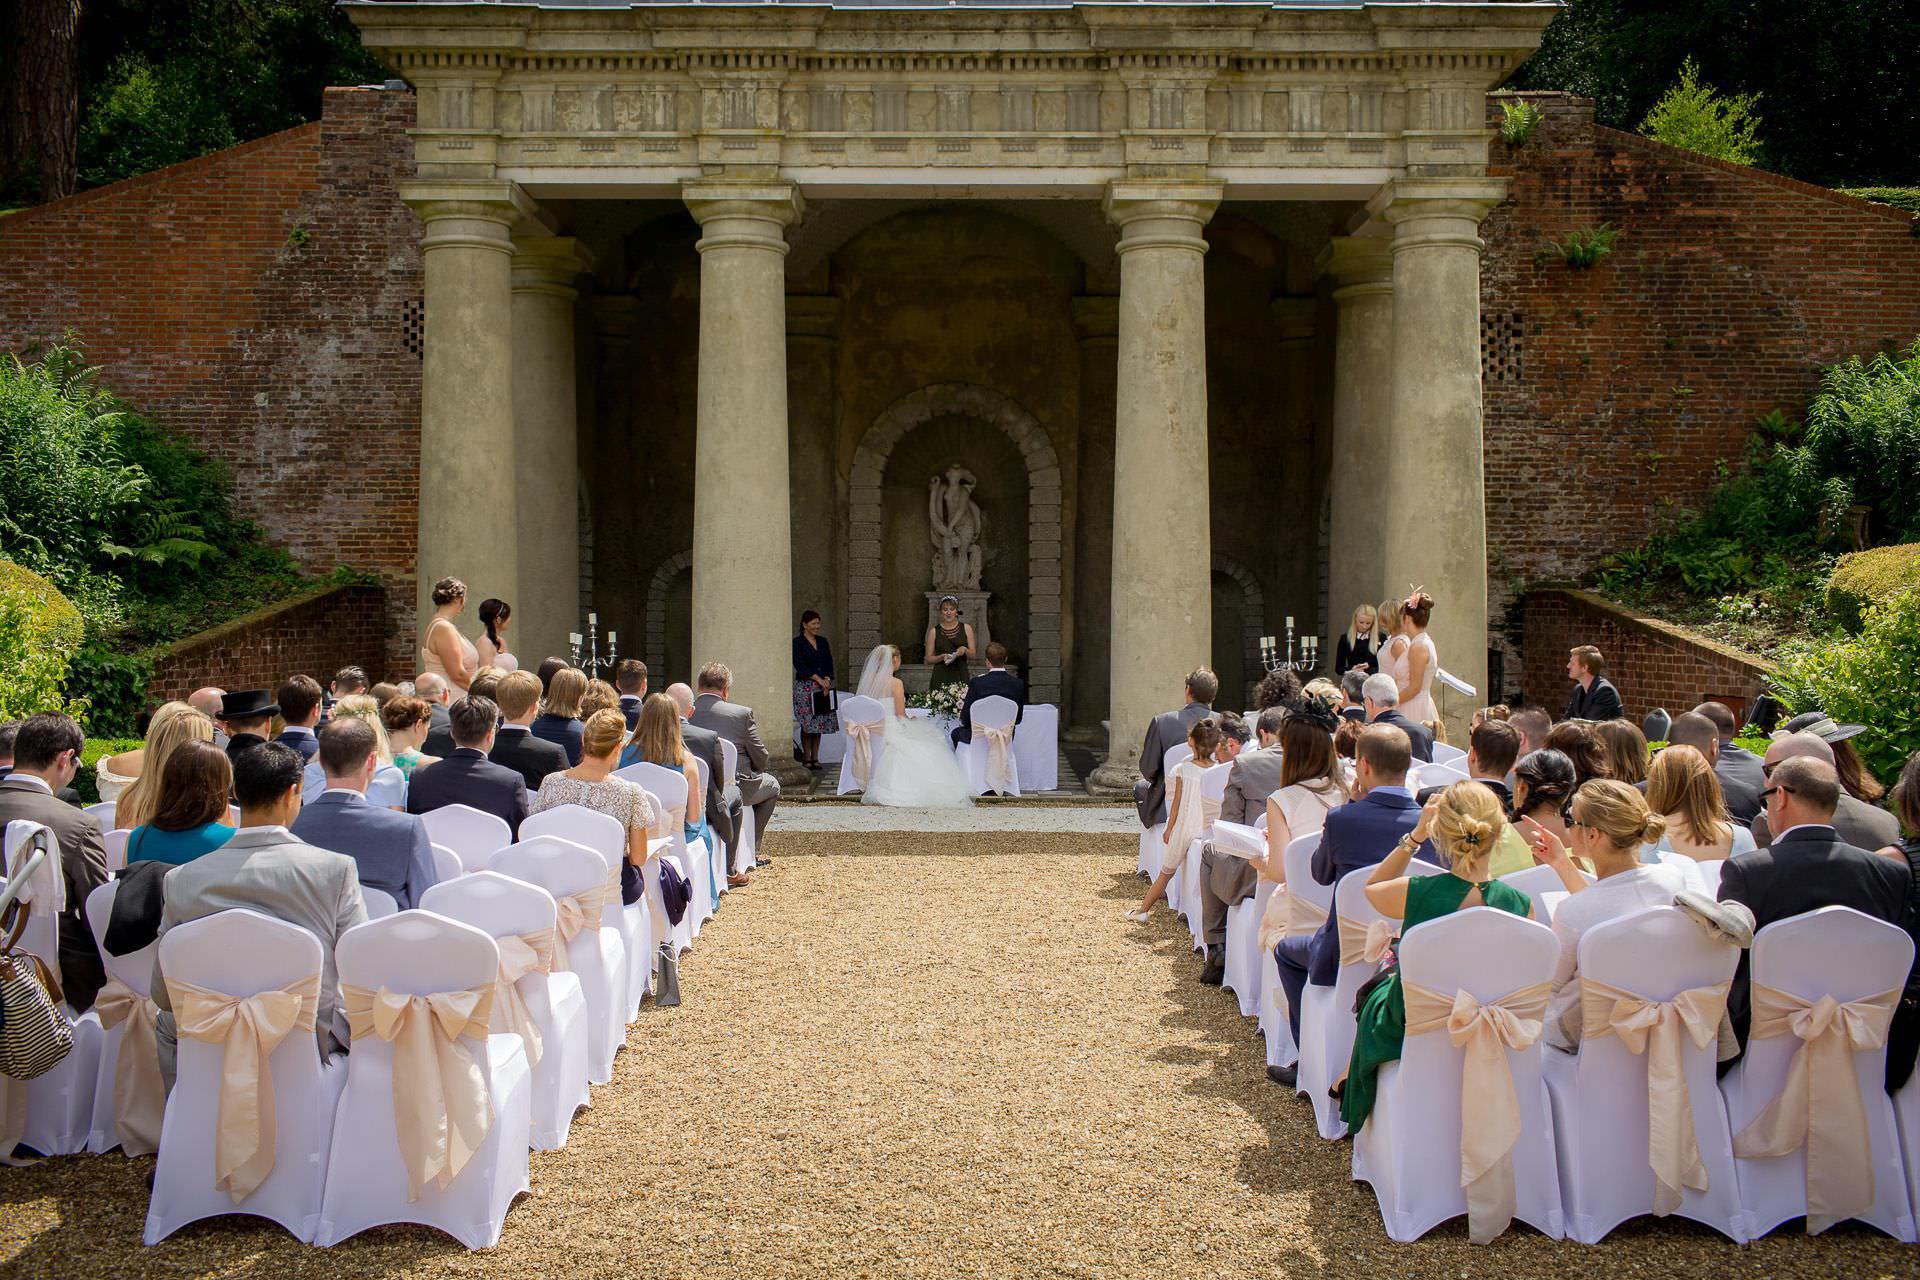 Wotton House wedding ceremony outdoors